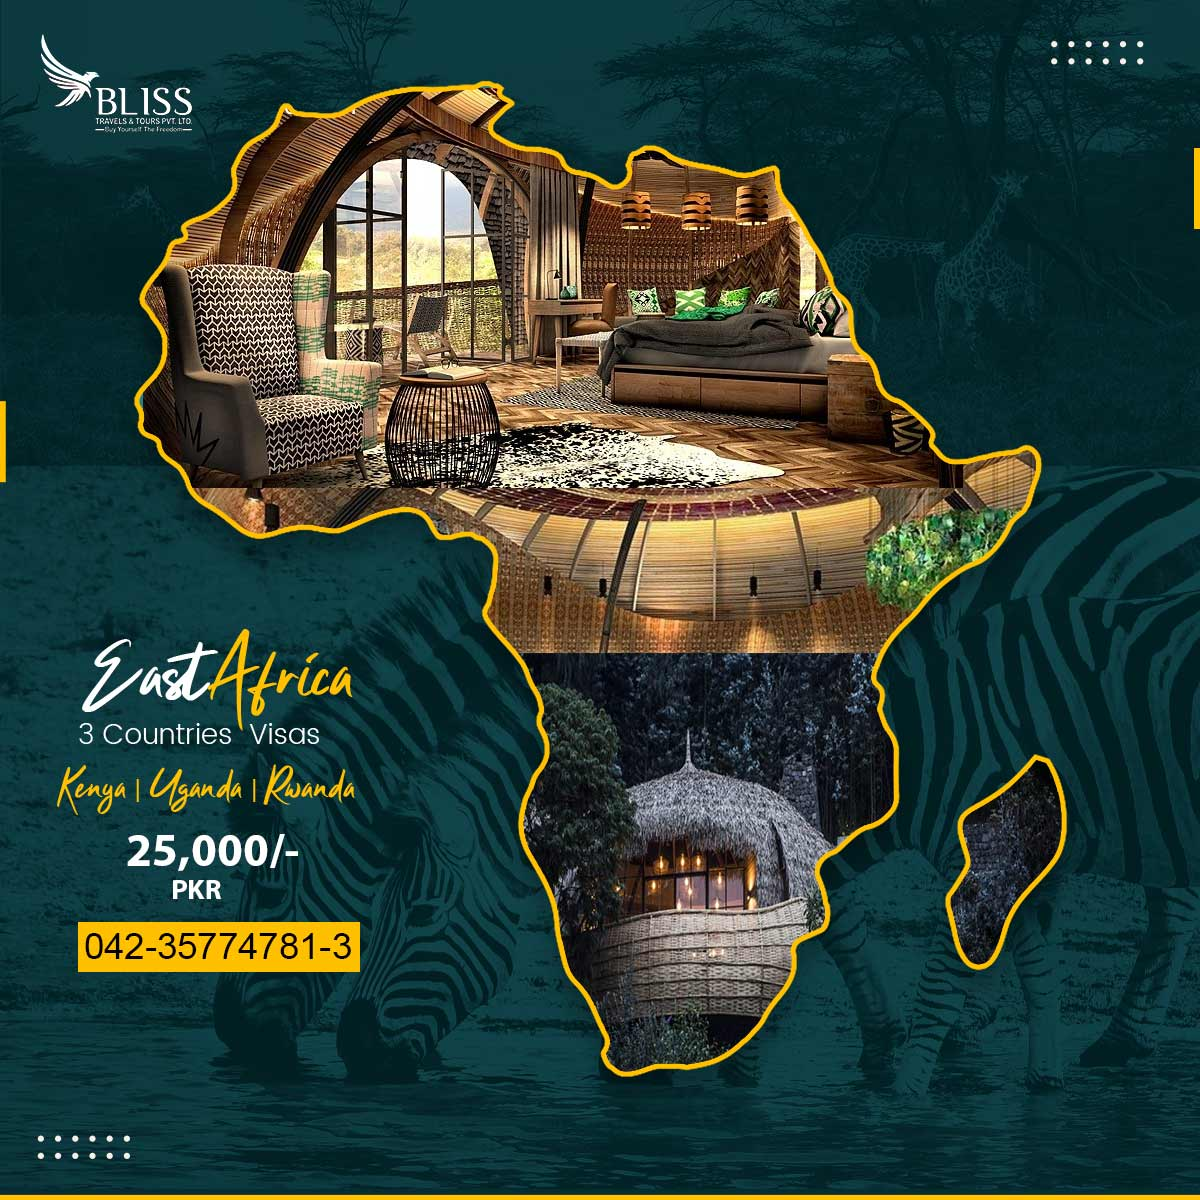 Eastern-African-Three-Countries-Visas